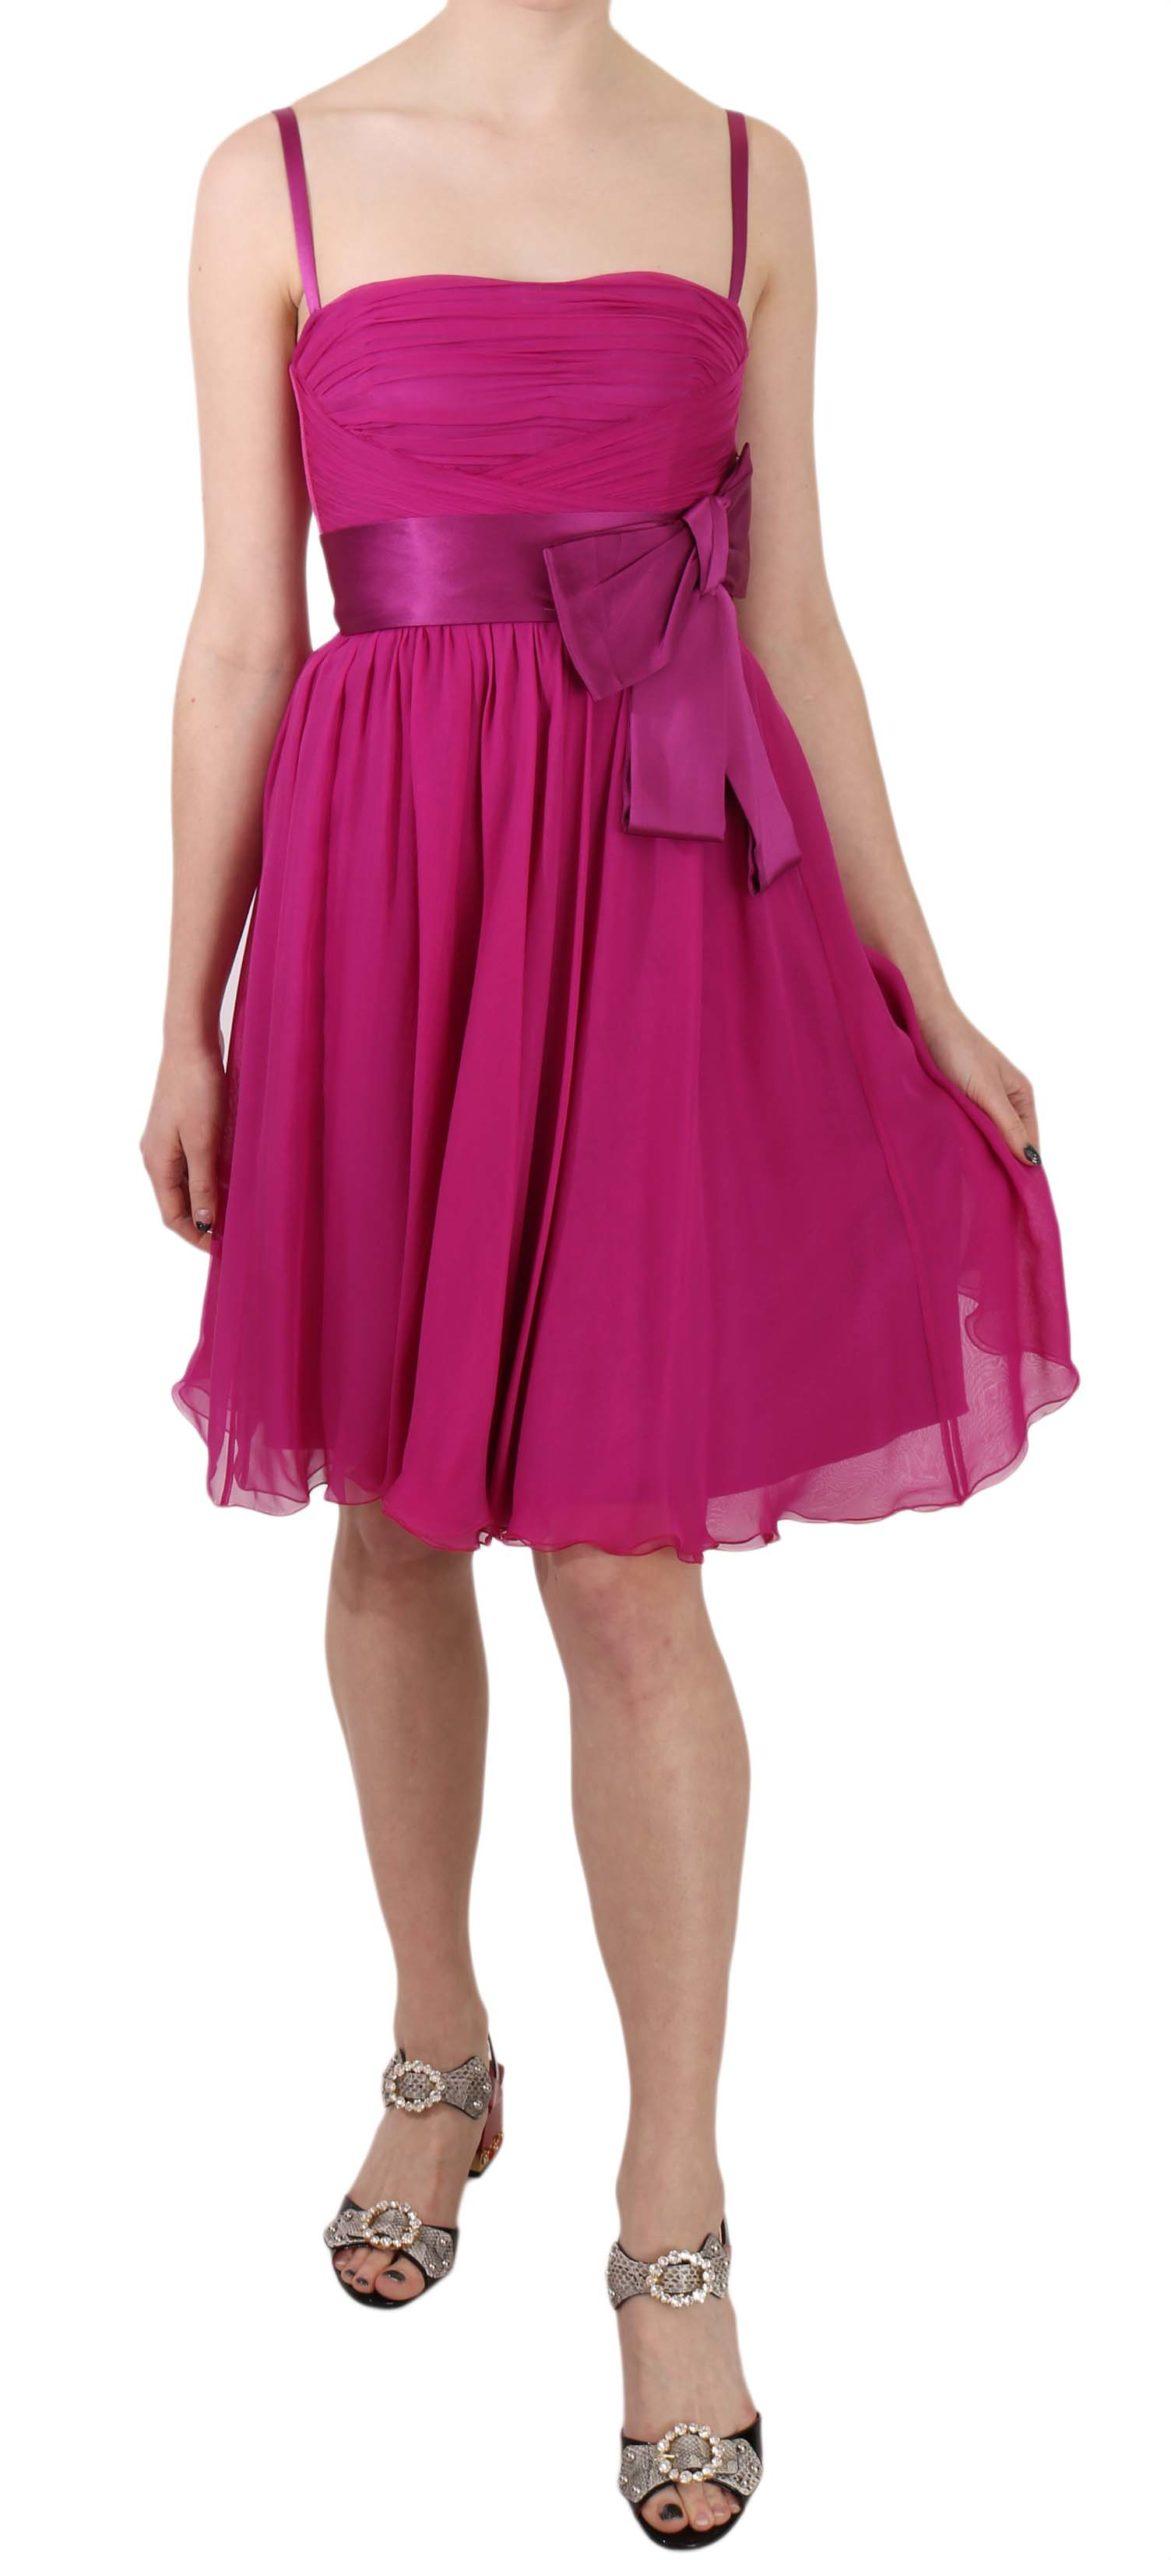 Dolce & Gabbana Women's Fuchsia Bow Silk Sleeveless Dress Pink DR1684 - IT38 XS